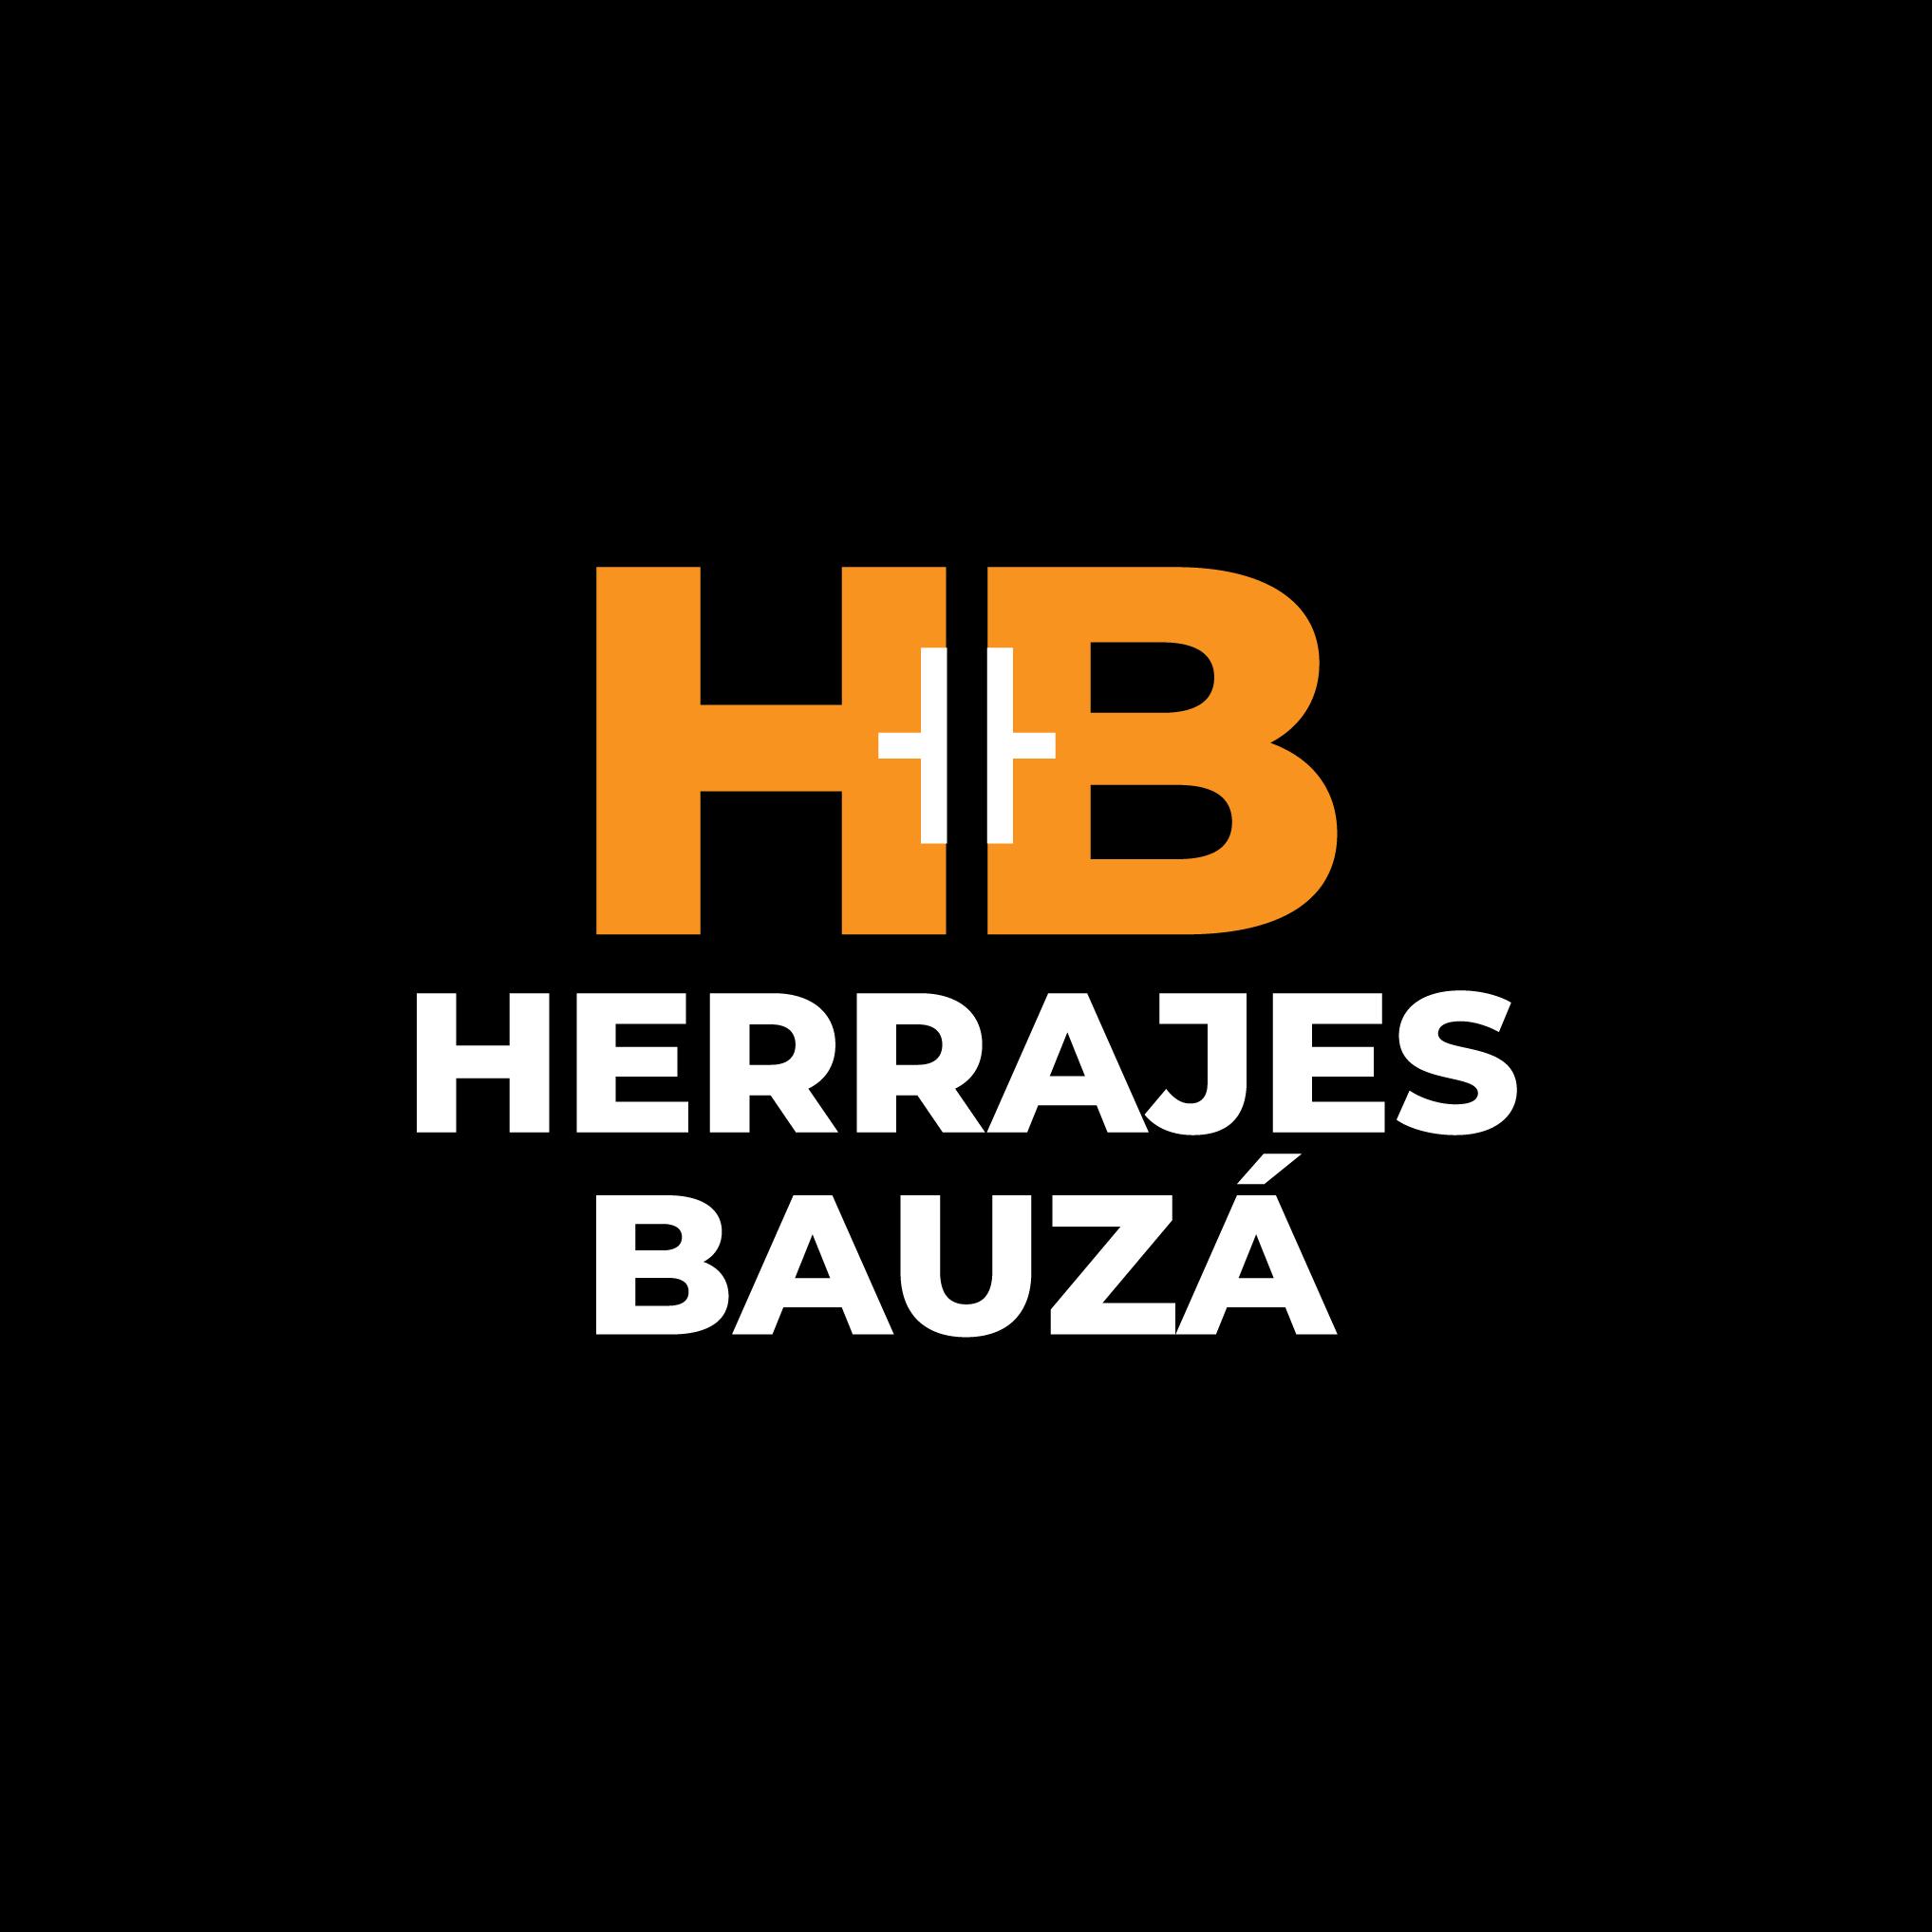 HERRAJES BAUZÁ.